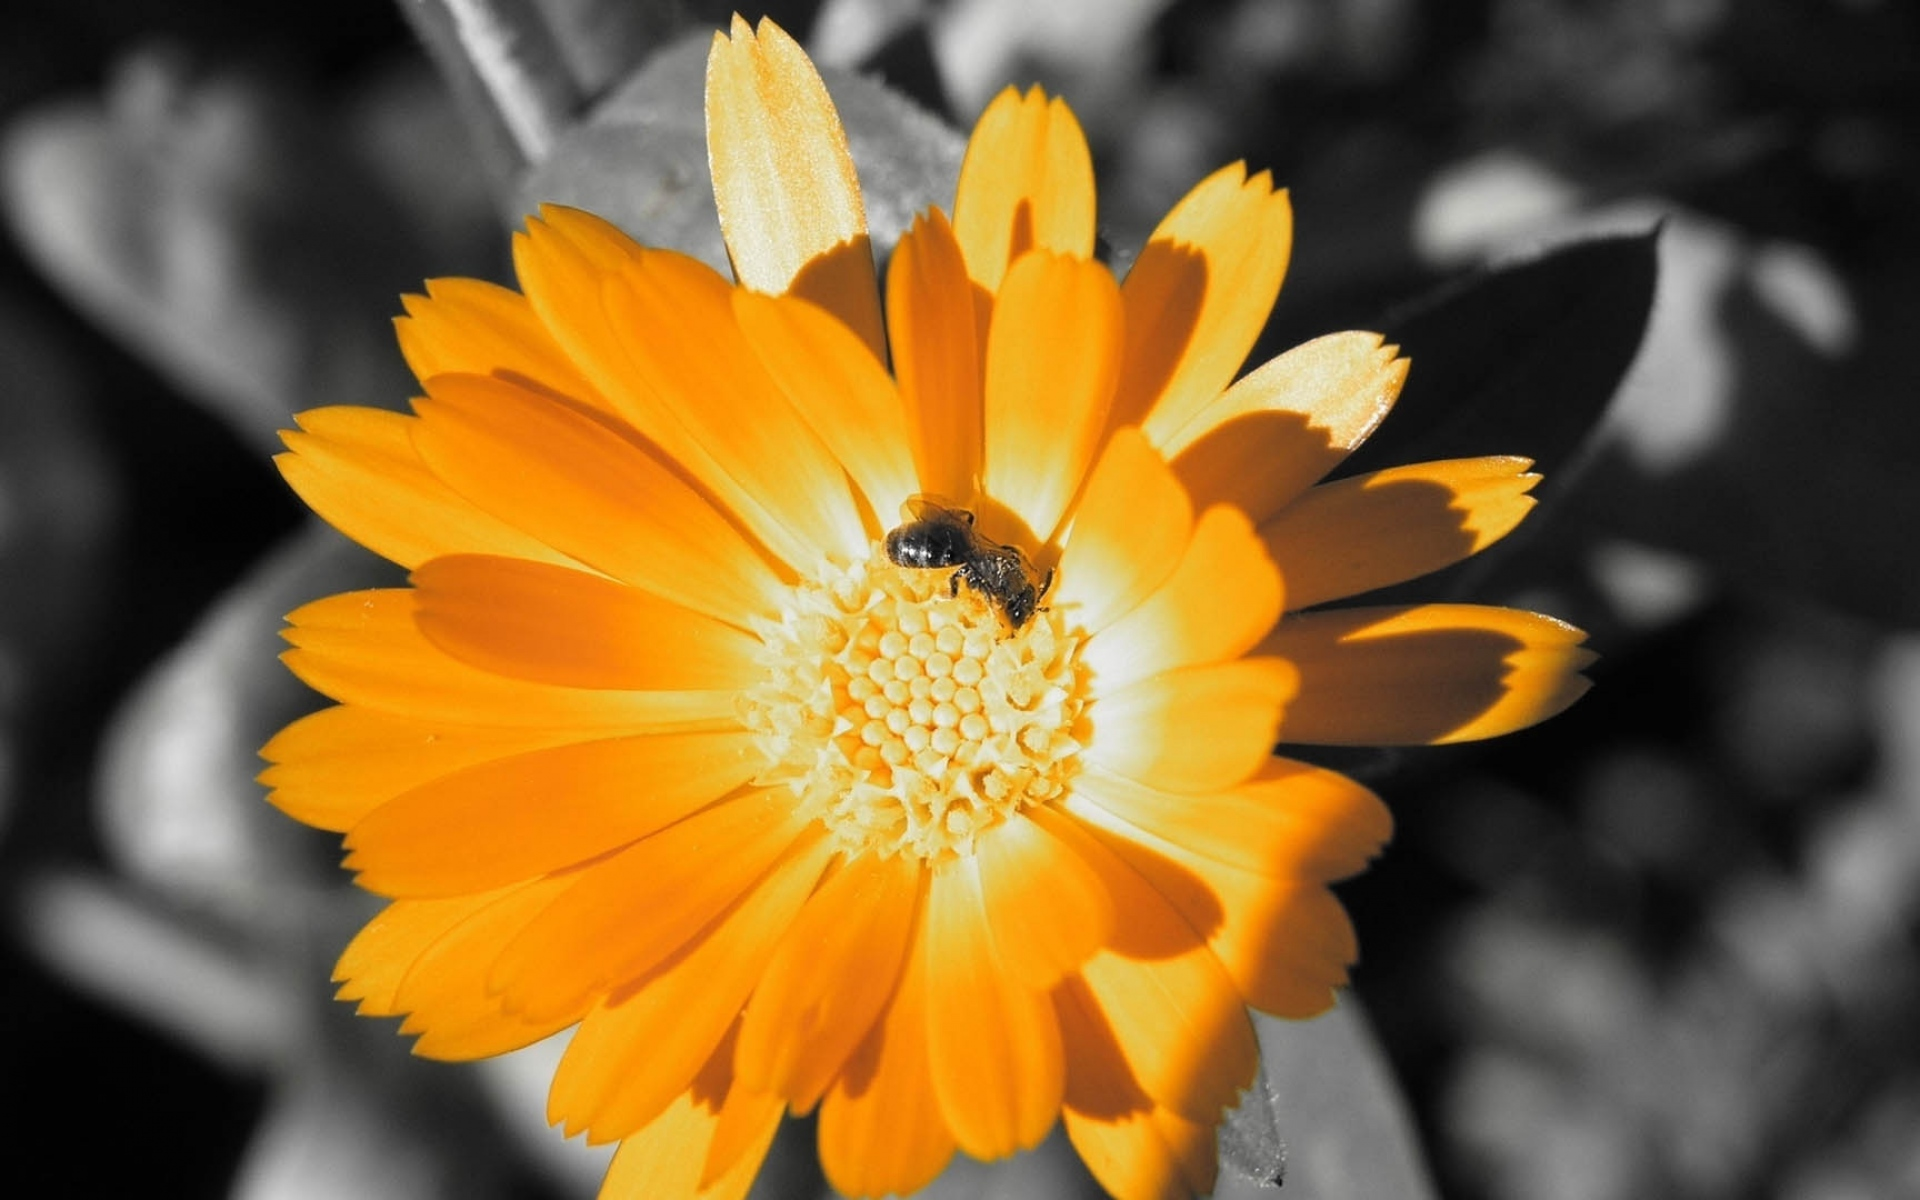 Картинки цветок, насекомое, лепестки фото и обои на рабочий стол